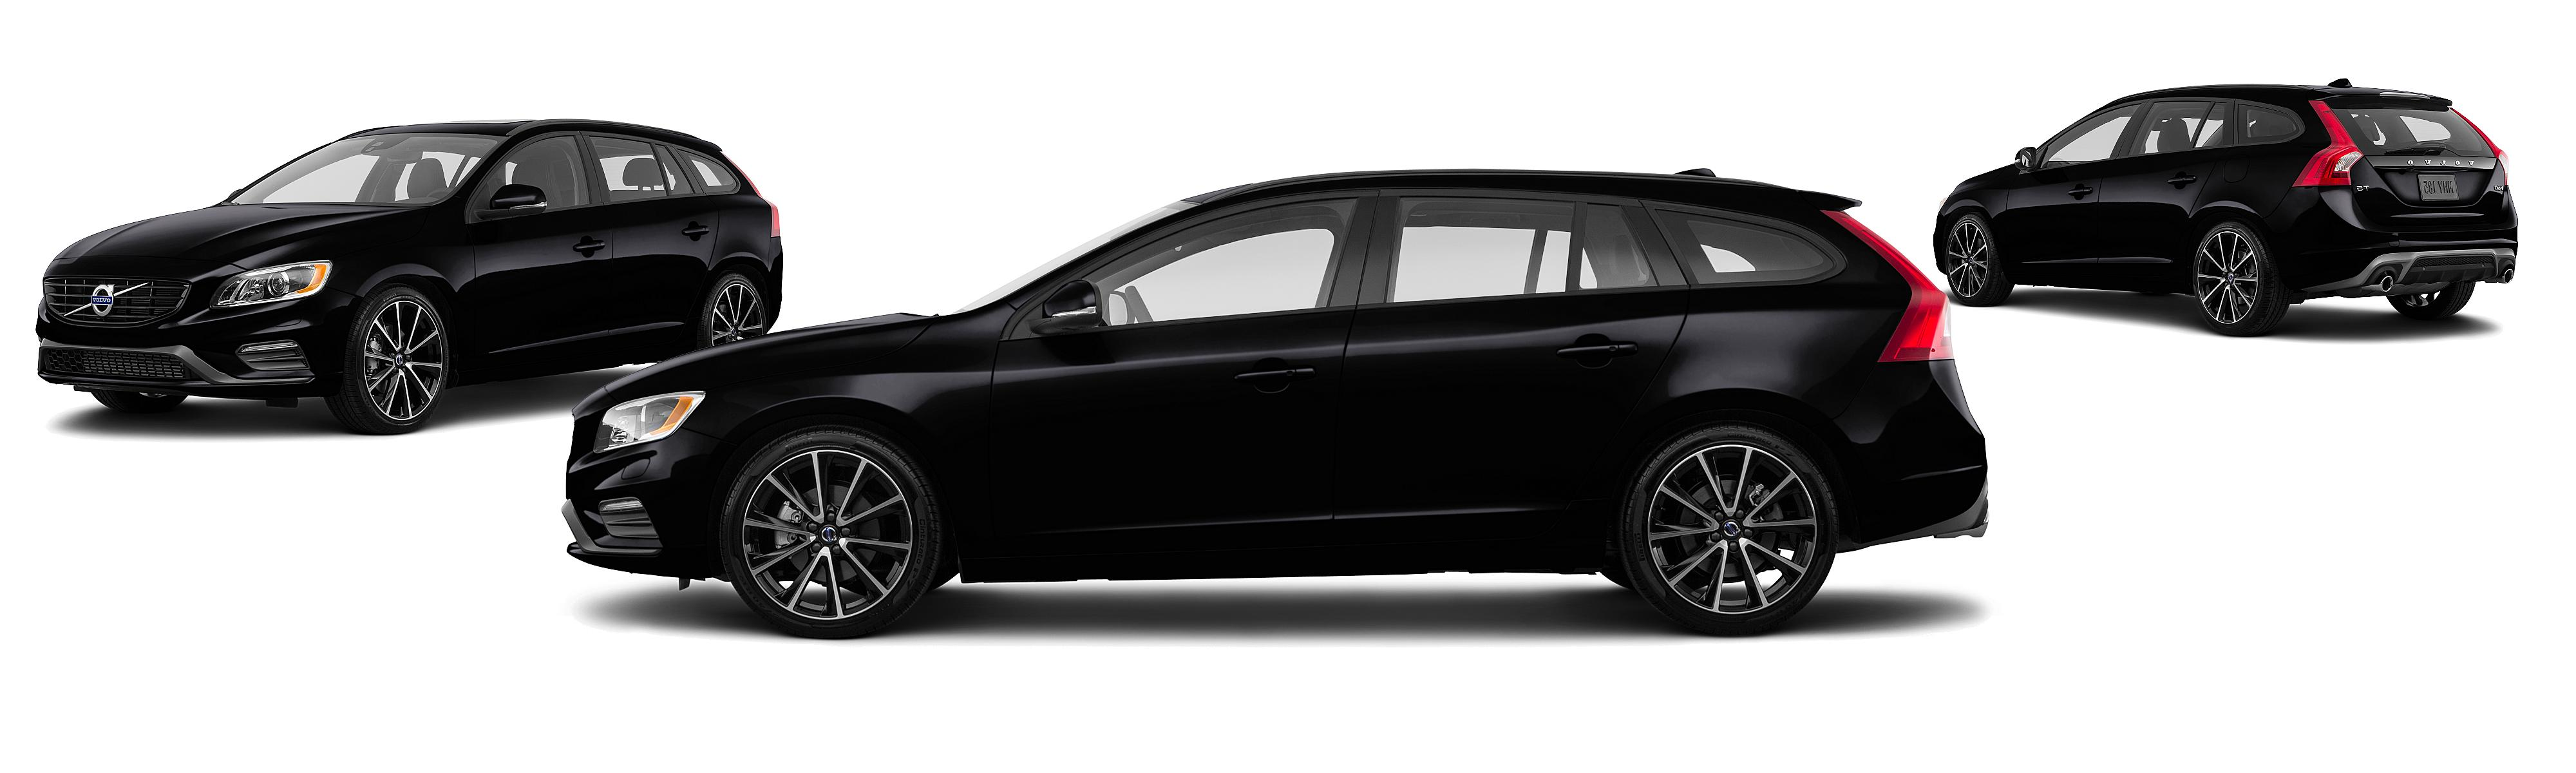 groovecar research deals large metallic drive black wagon lease volvo e onyx nj premier awd composite